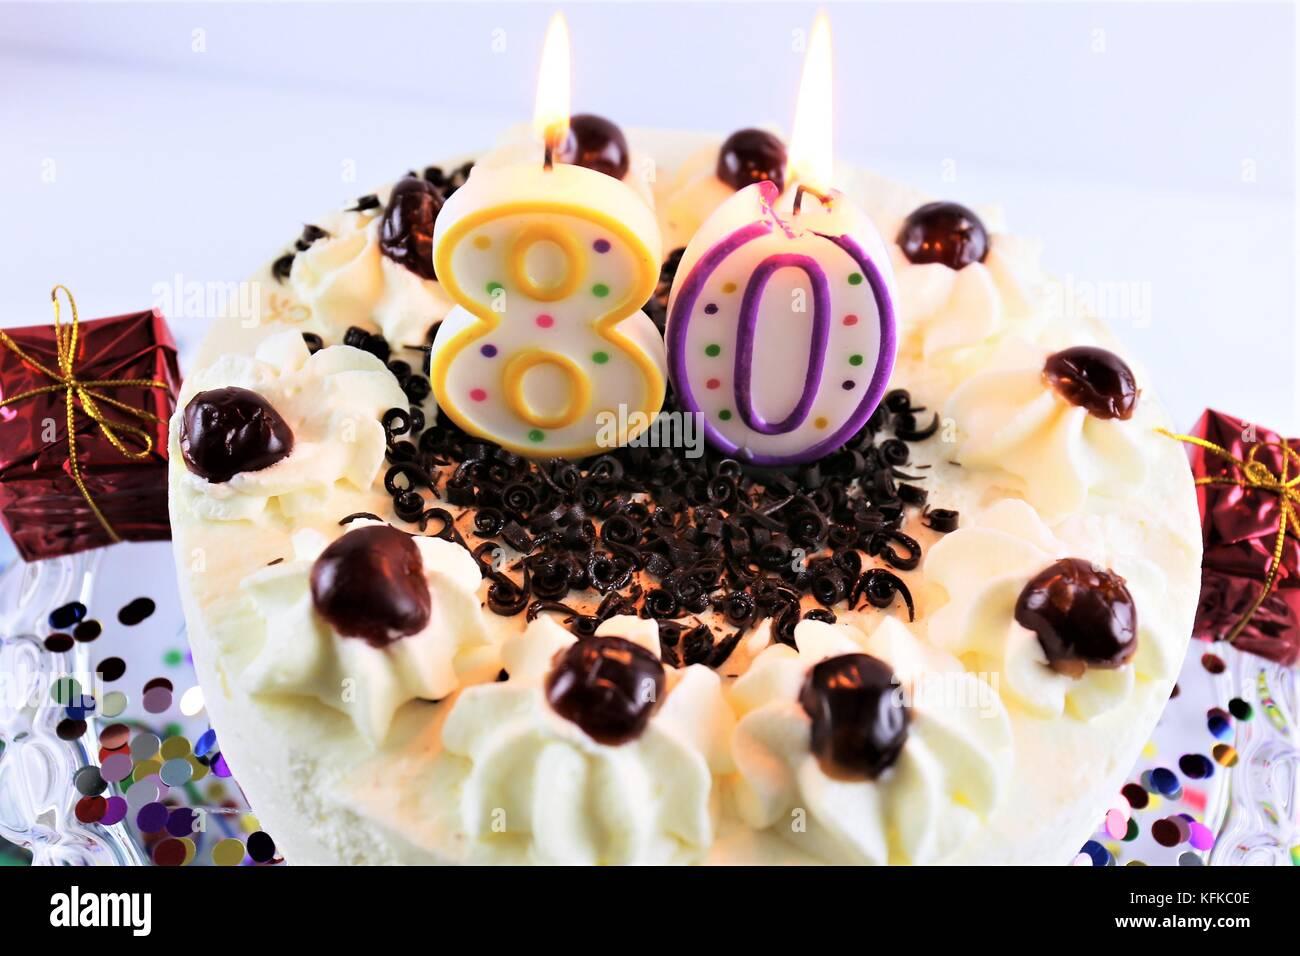 80th Birthday Cake Stock Photos 80th Birthday Cake Stock Images